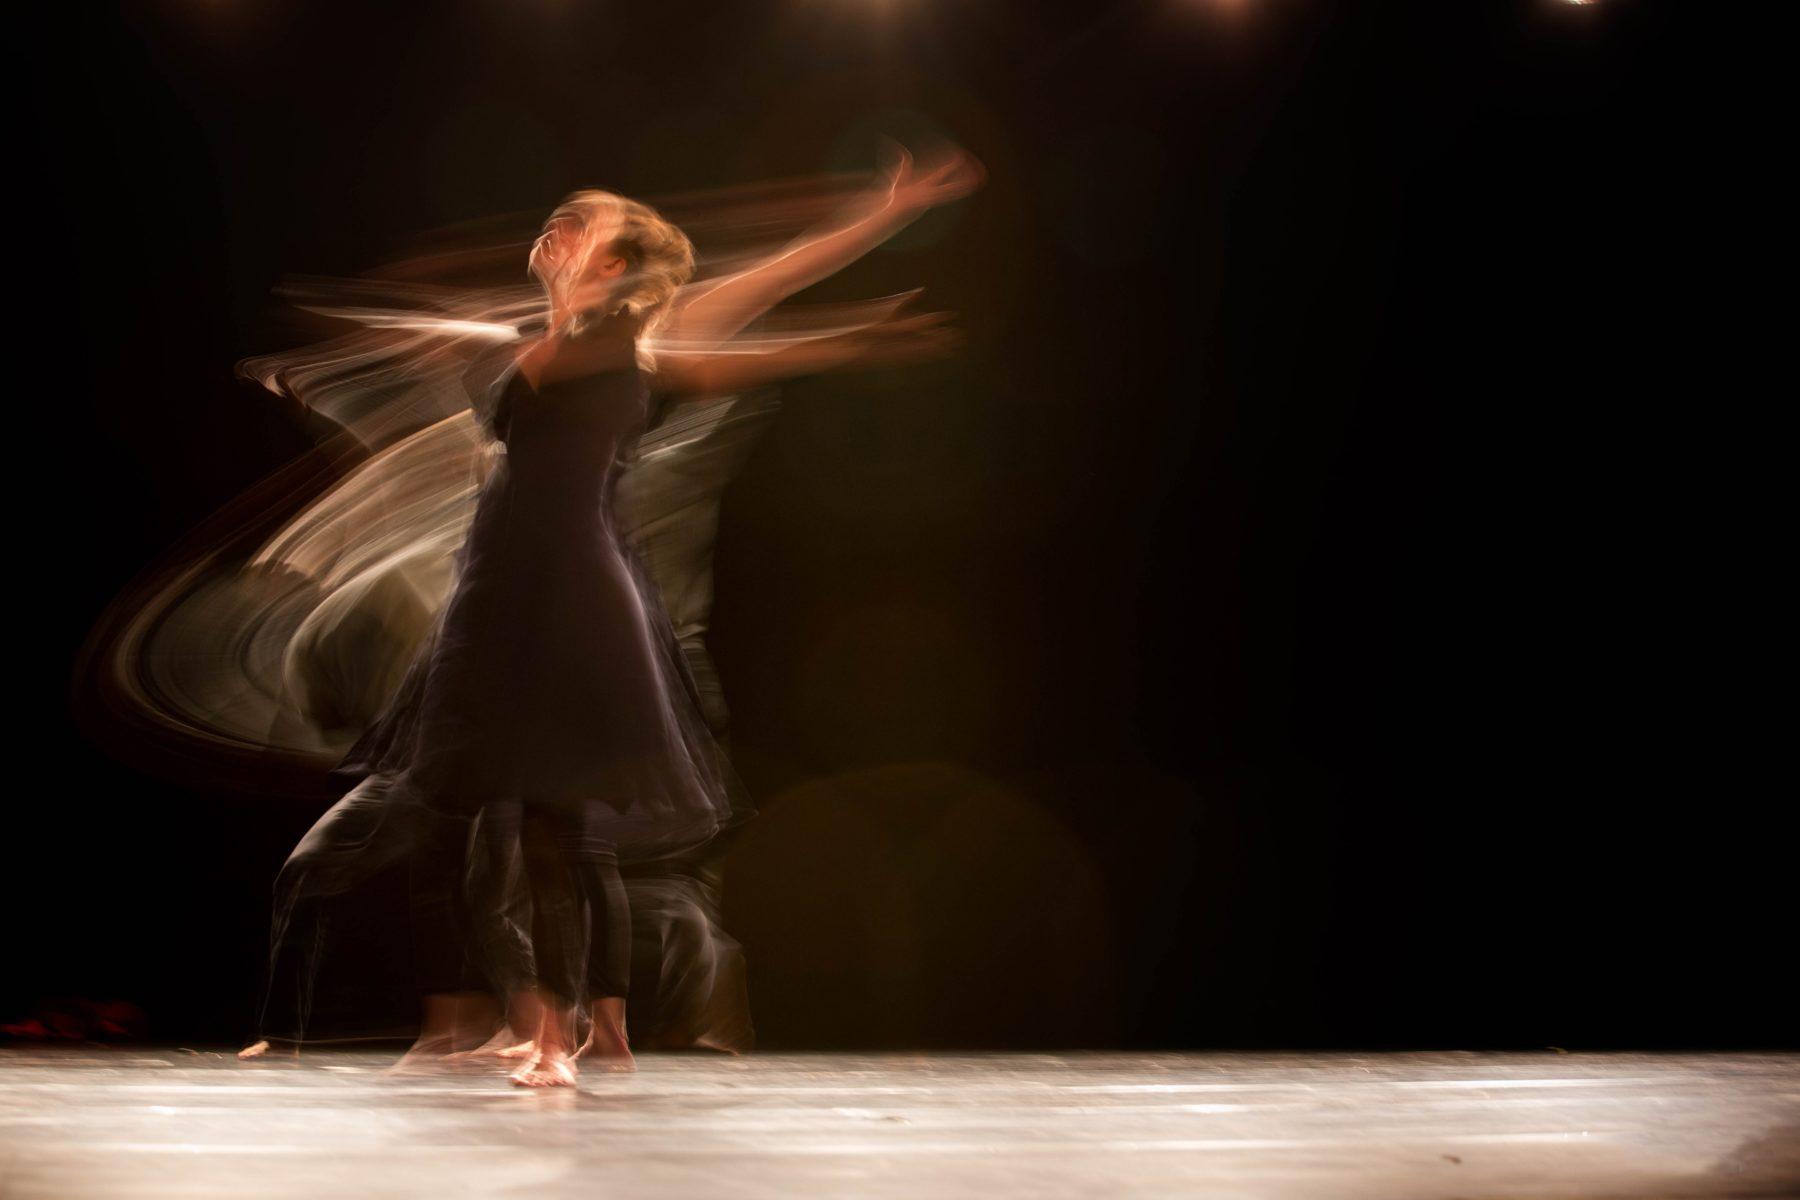 Shamanic Healing Shamanism Ecstatic Awakening Dance™ mental Health